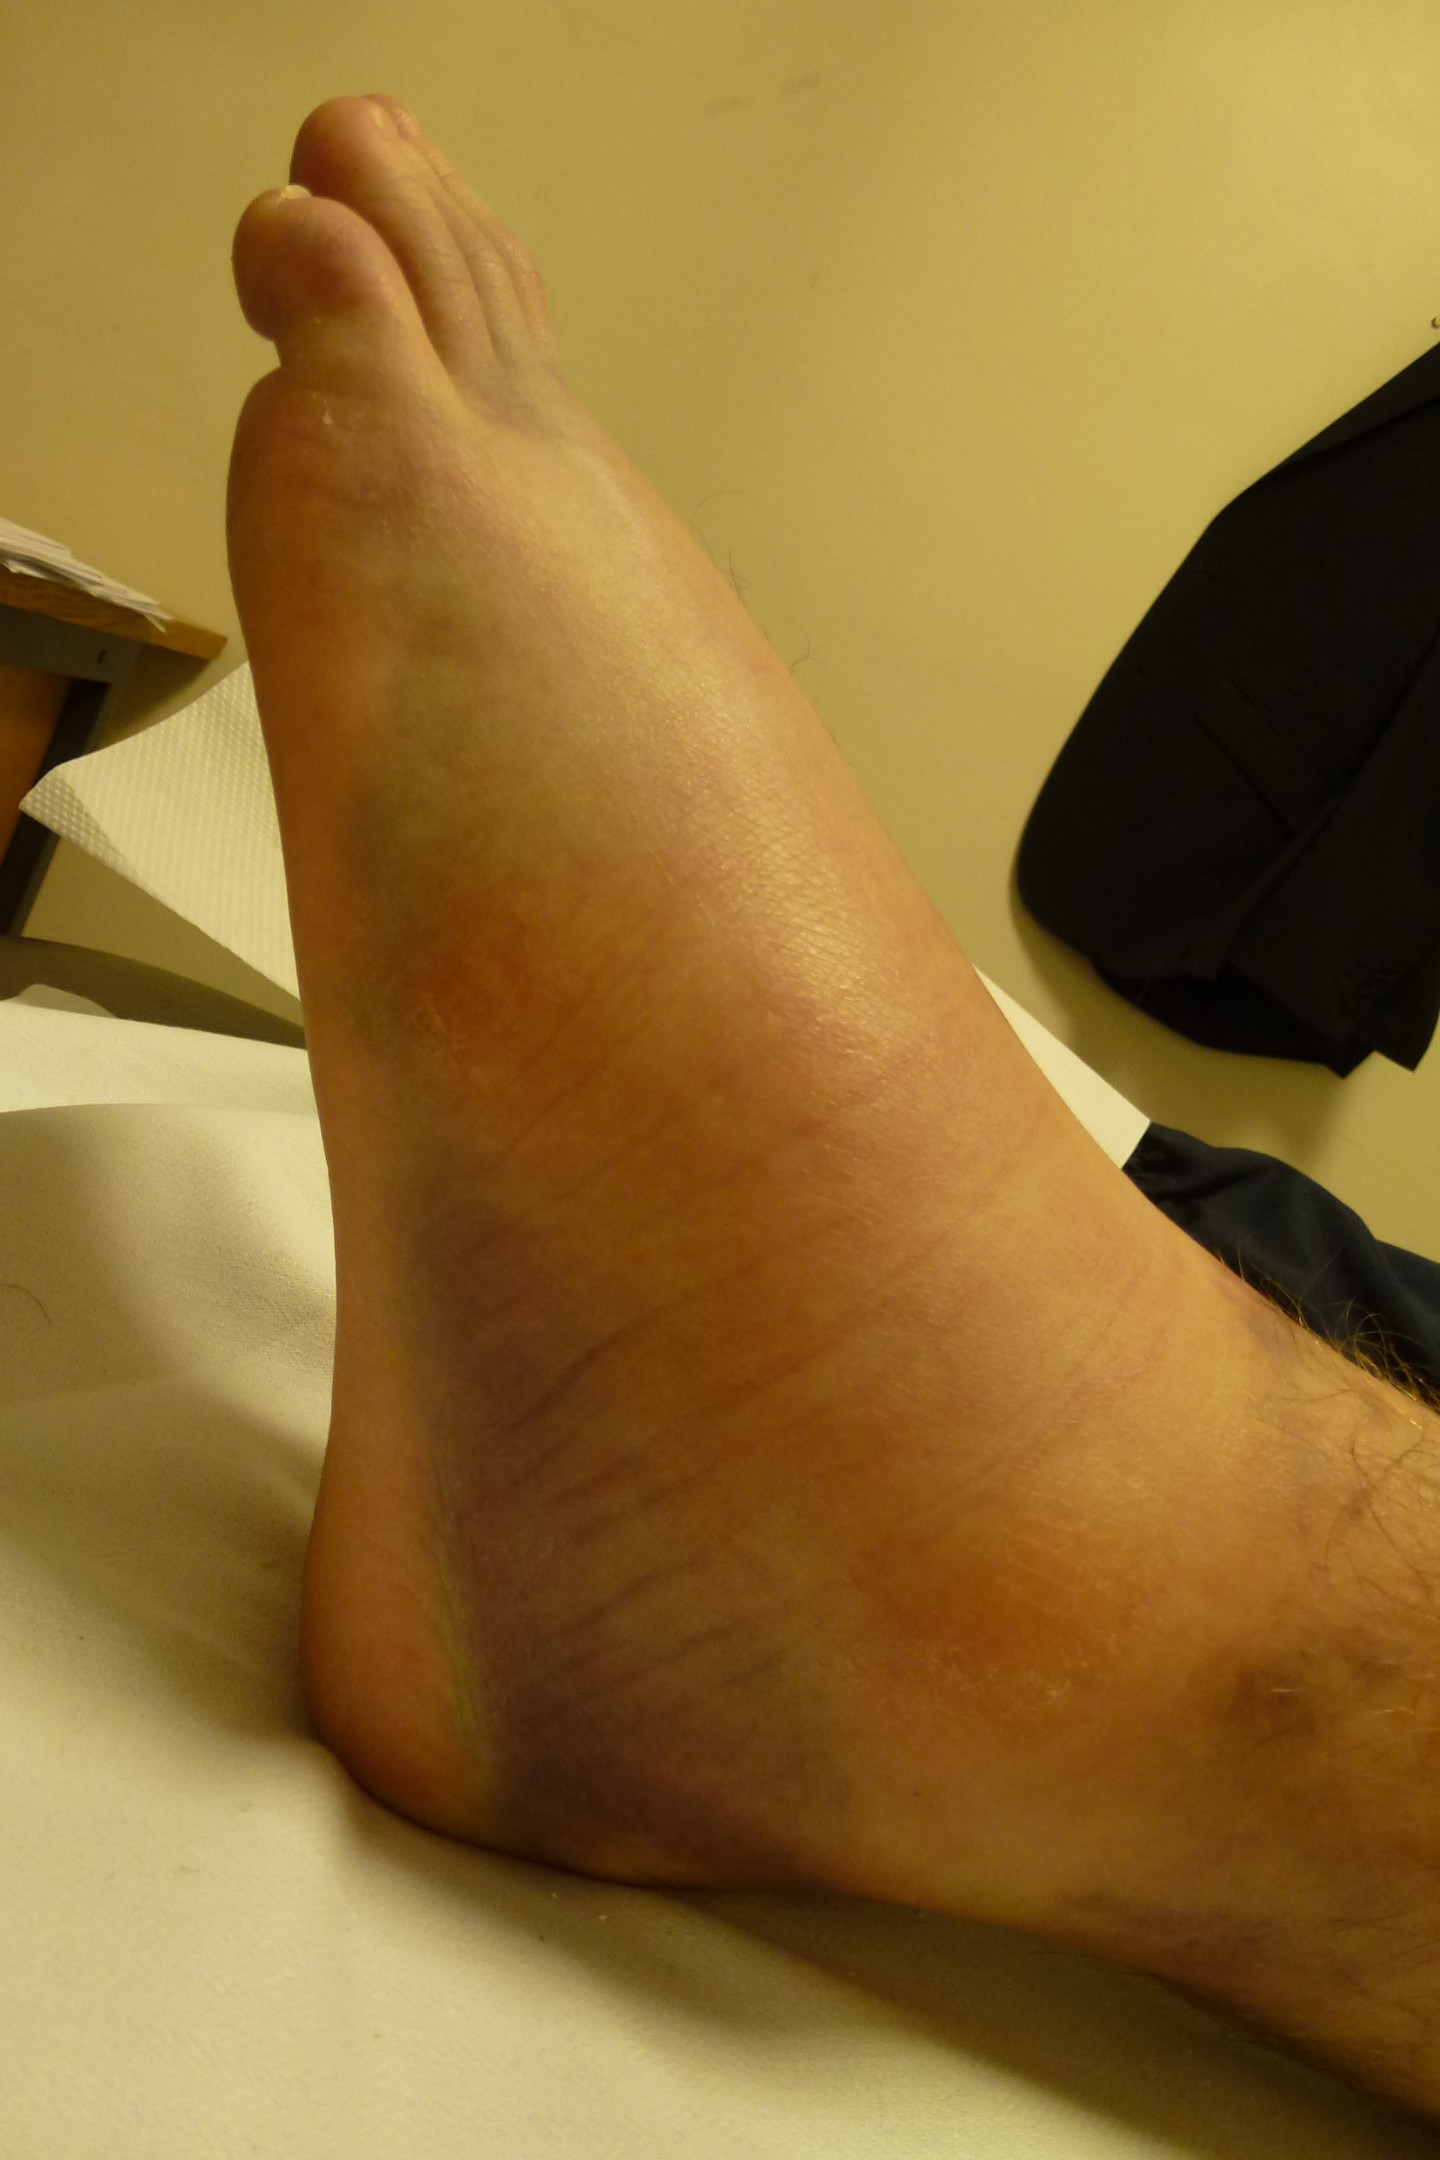 Ankle Sprain Causes